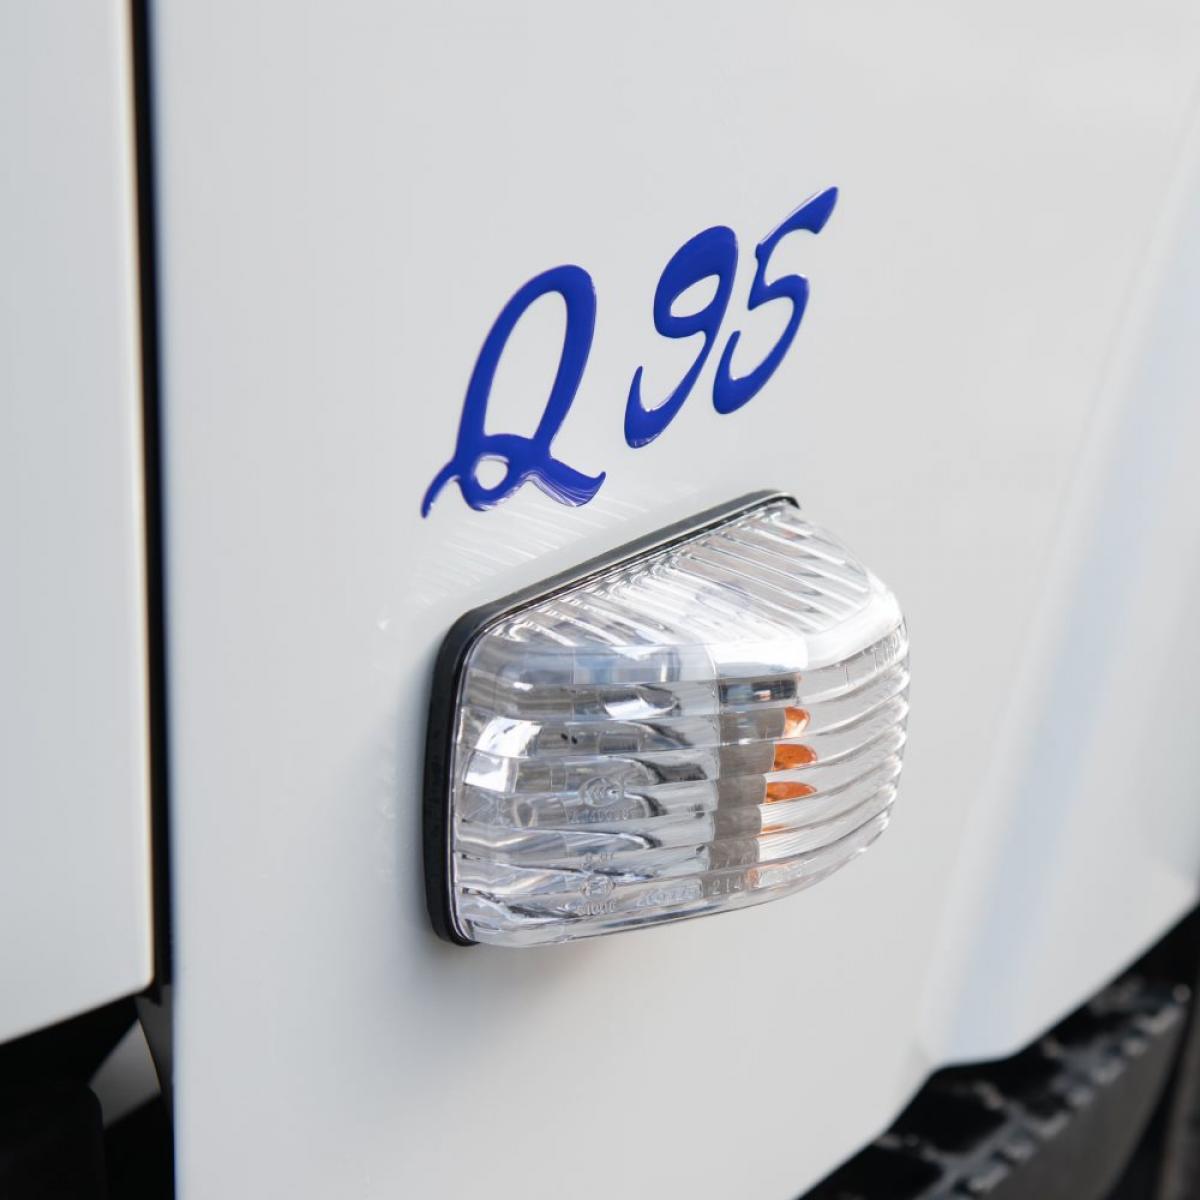 Isuzu Q95 Potencia